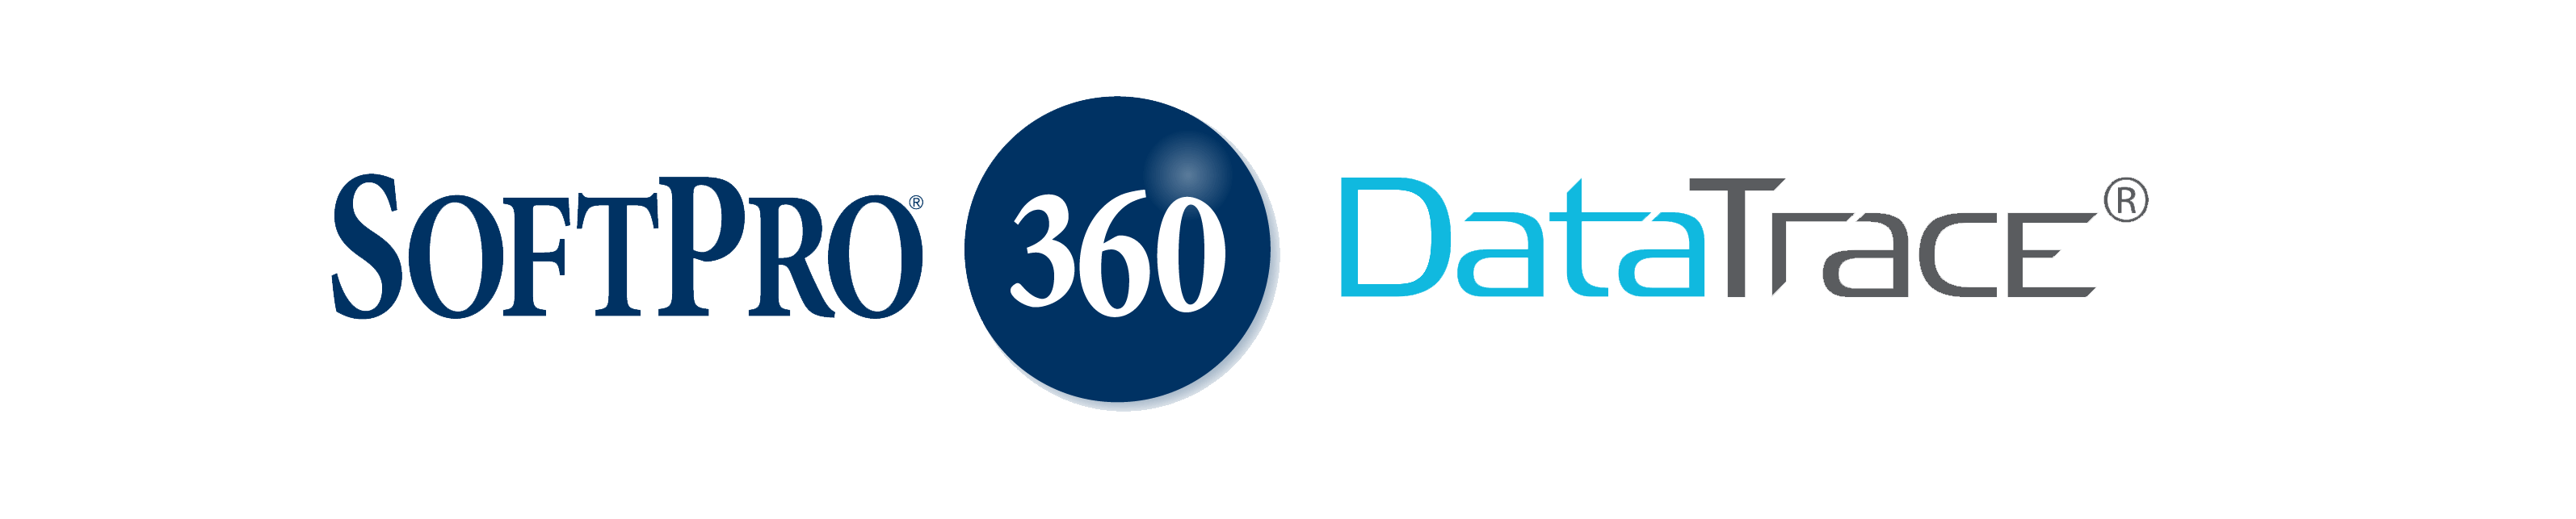 DataTrace_Cropped2